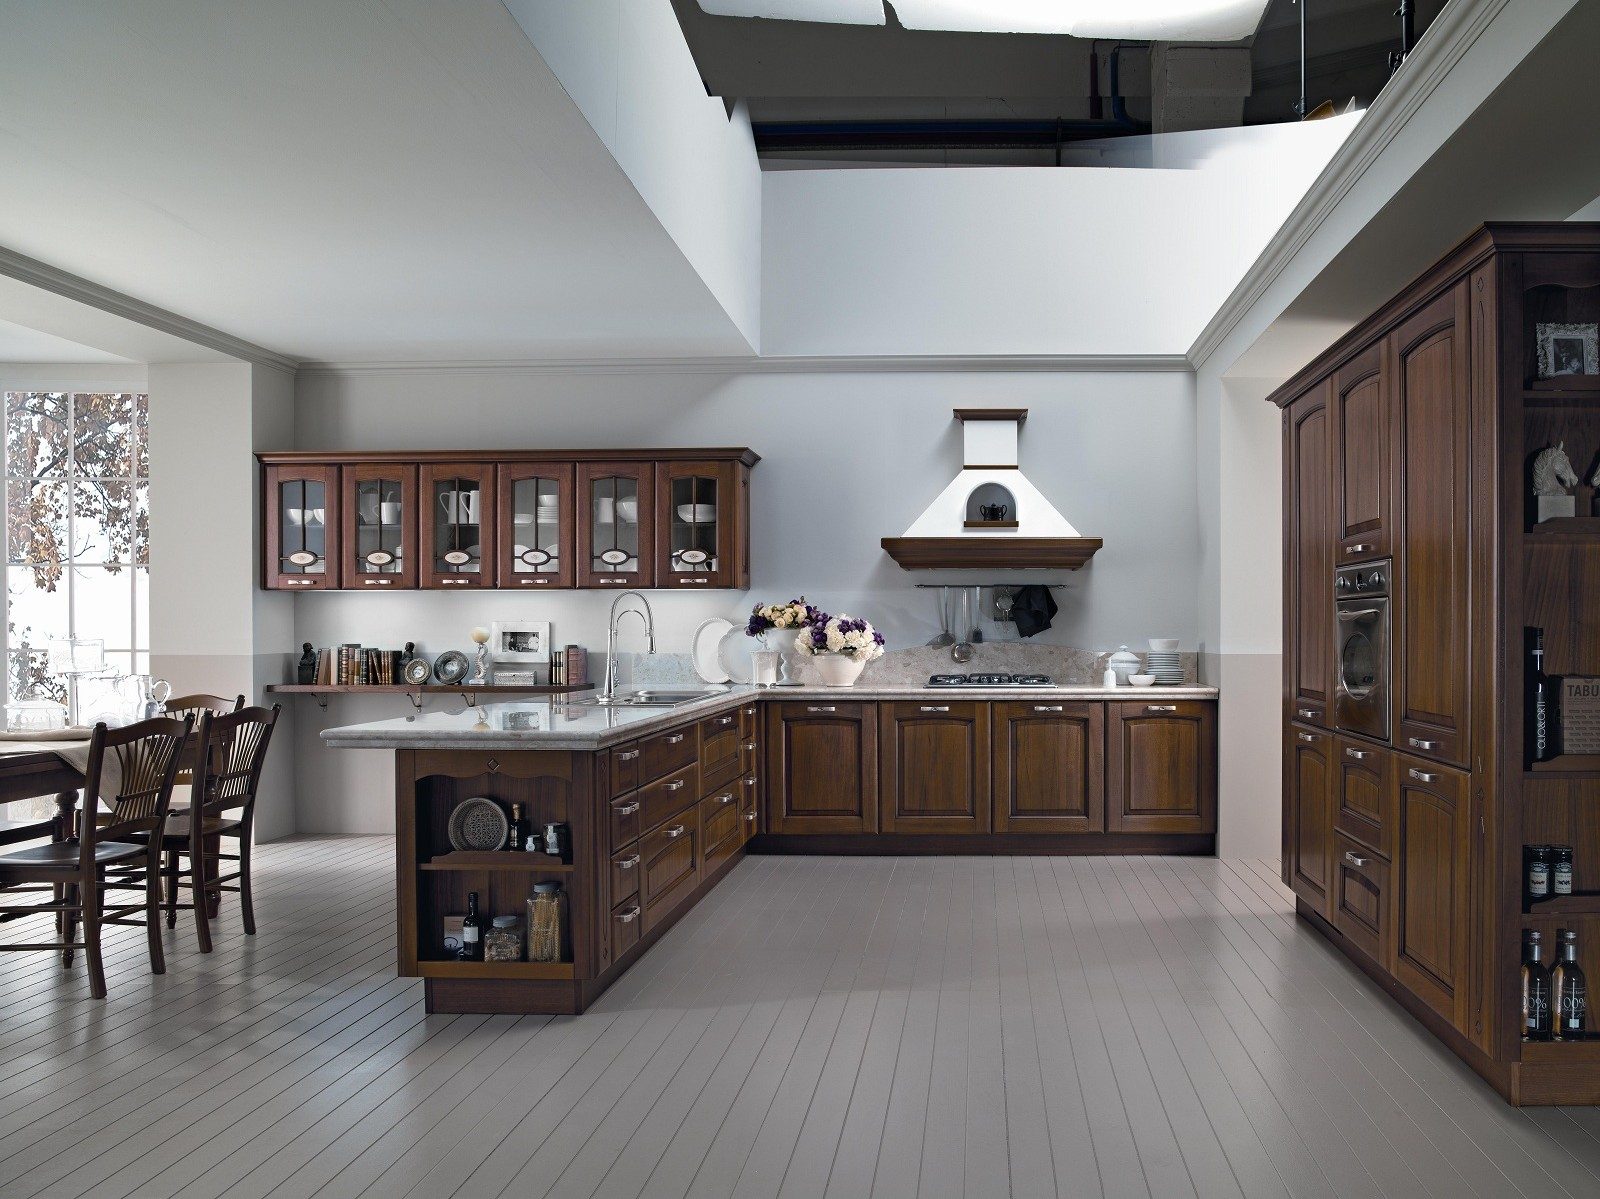 Proposte D'arredo Cucine Veronica Noce Di Cucine Lube #5E483F 1600 1199 Cucine Veneta O Lube